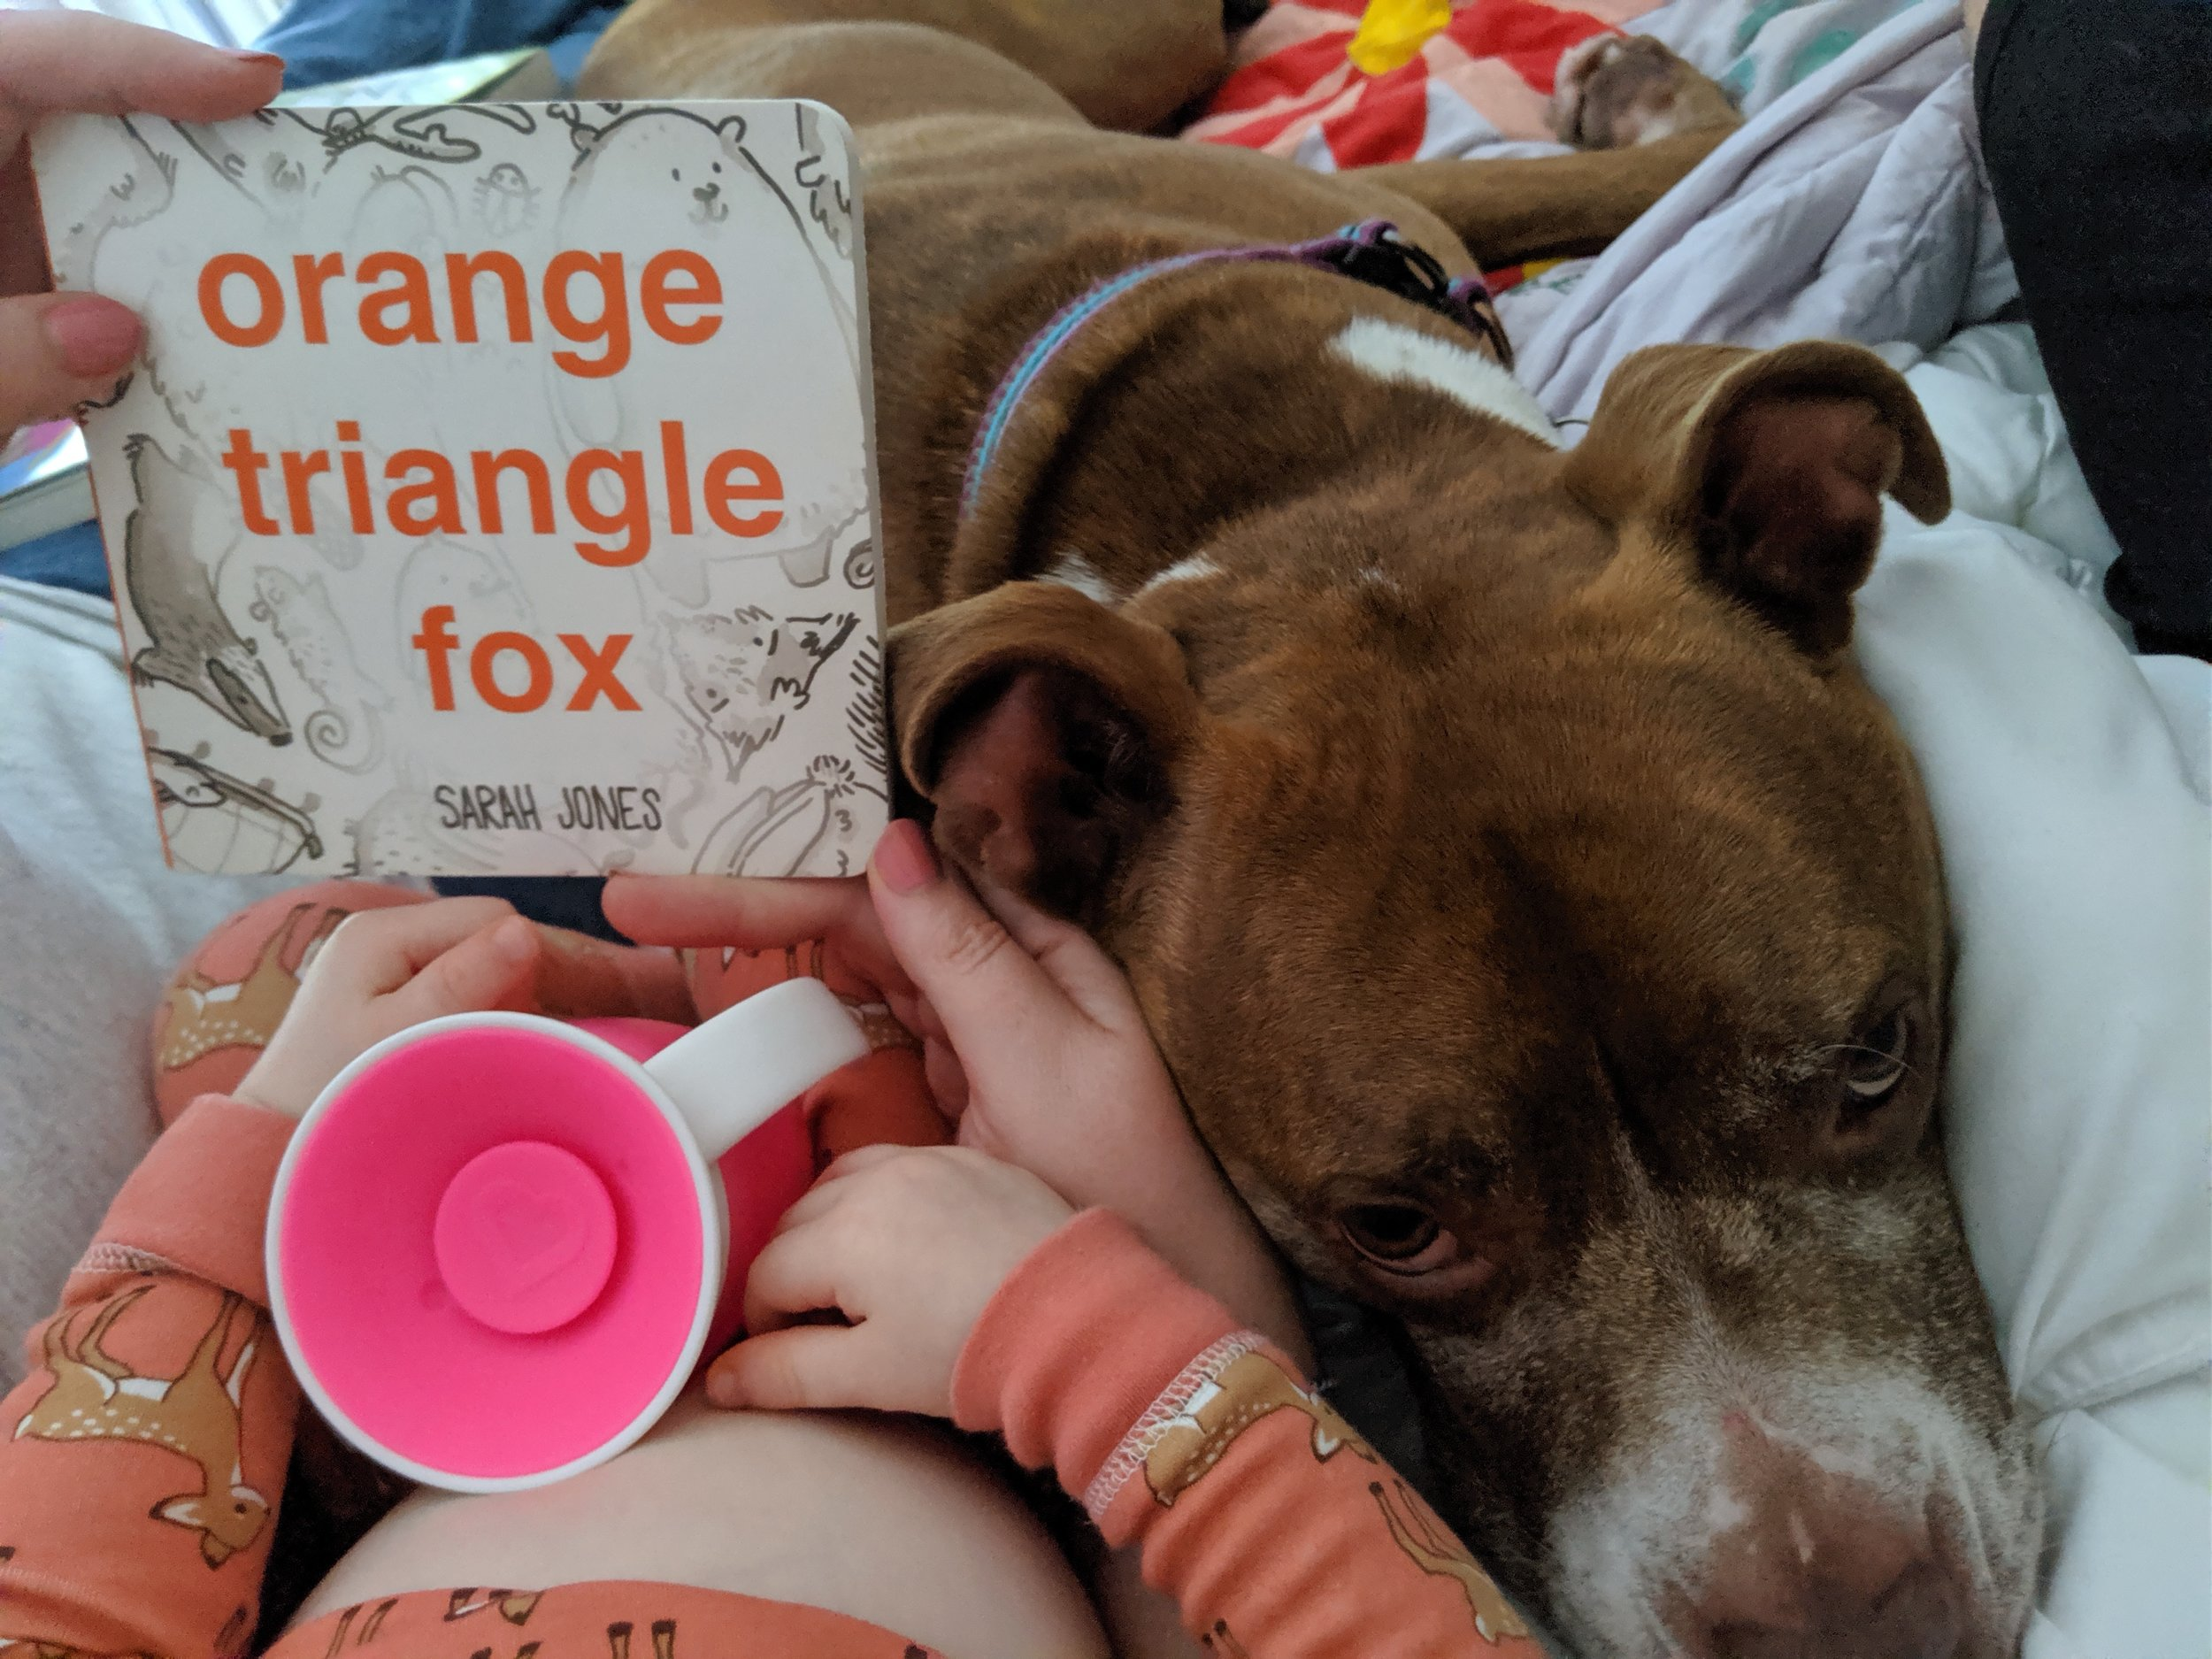 blue manatee press_orange triangle fox_dog picture.JPG